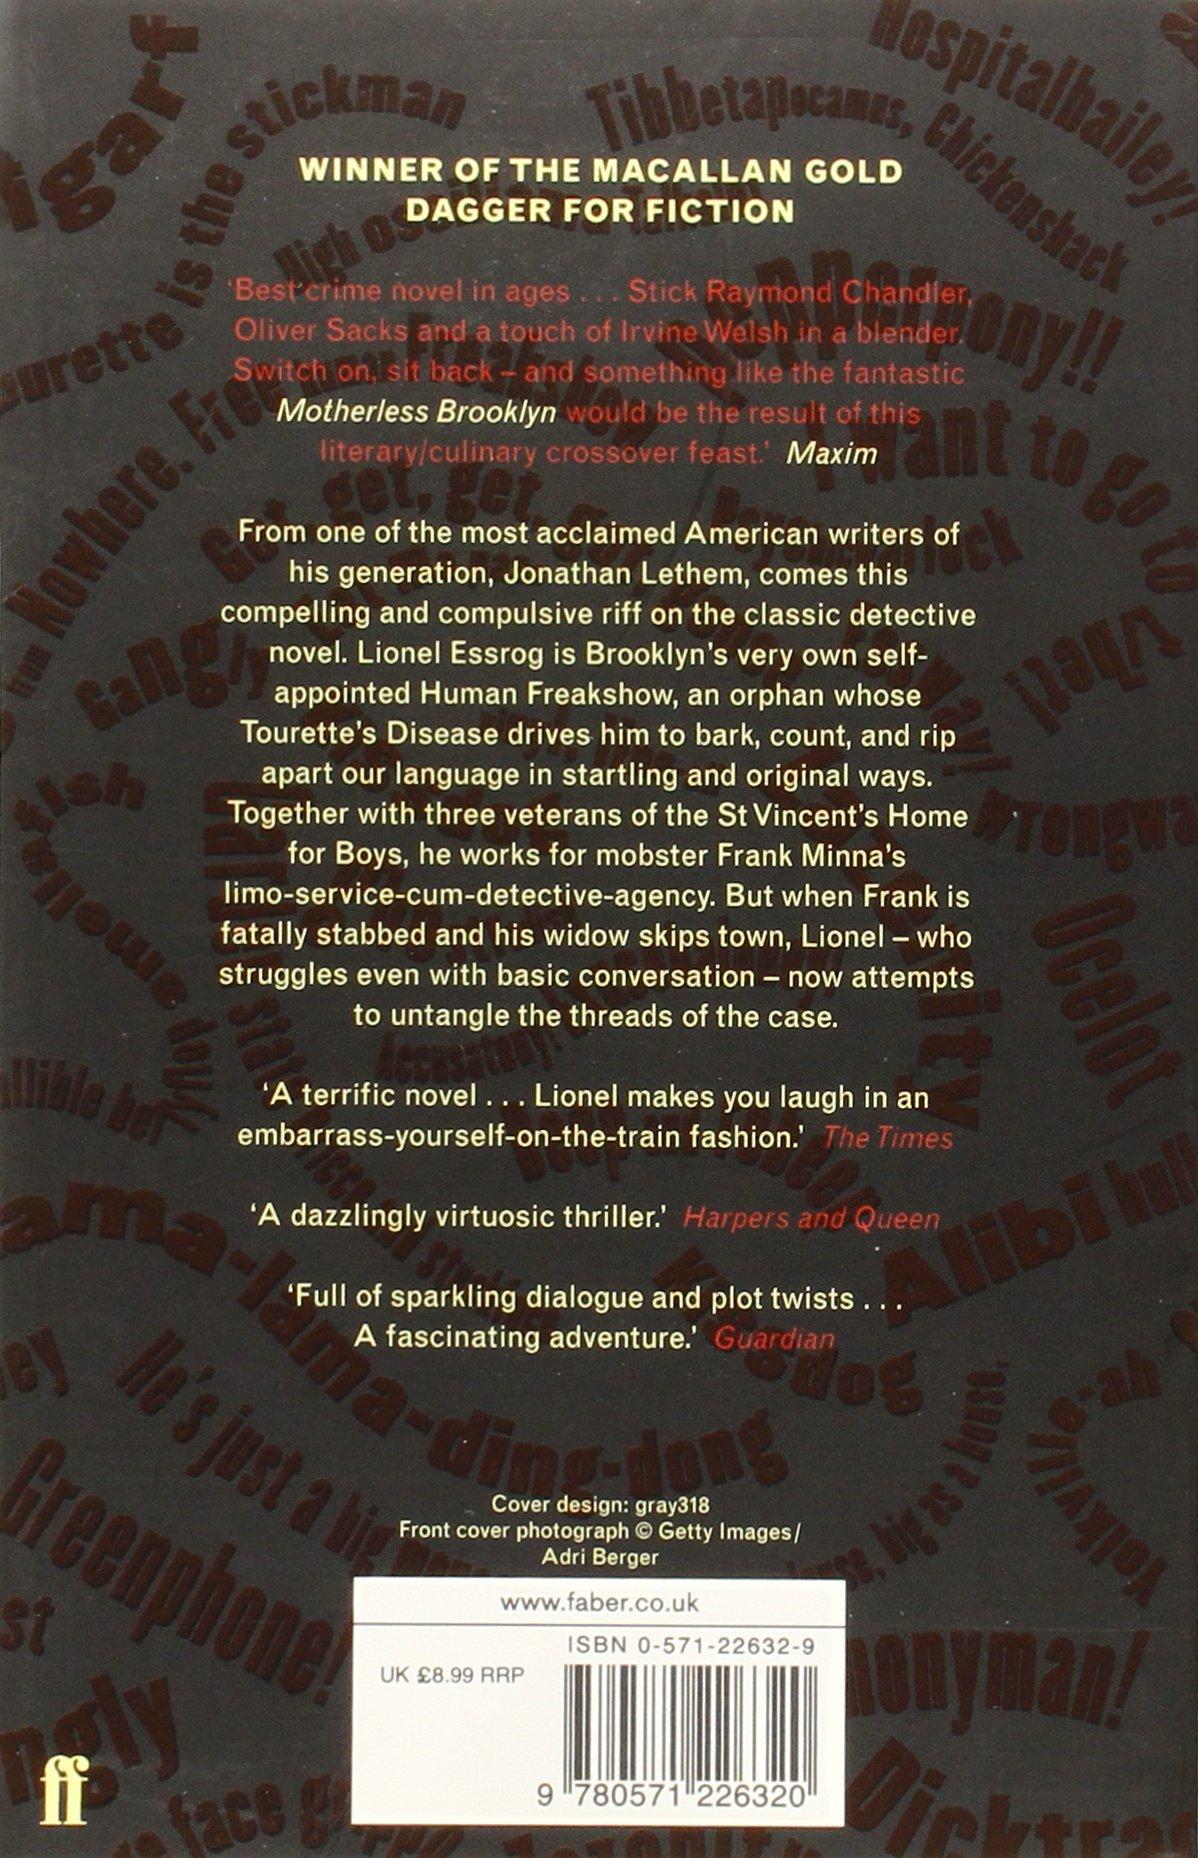 Motherless Brooklyn: Amazon: Jonathan Lethem: 9780571226320: Books